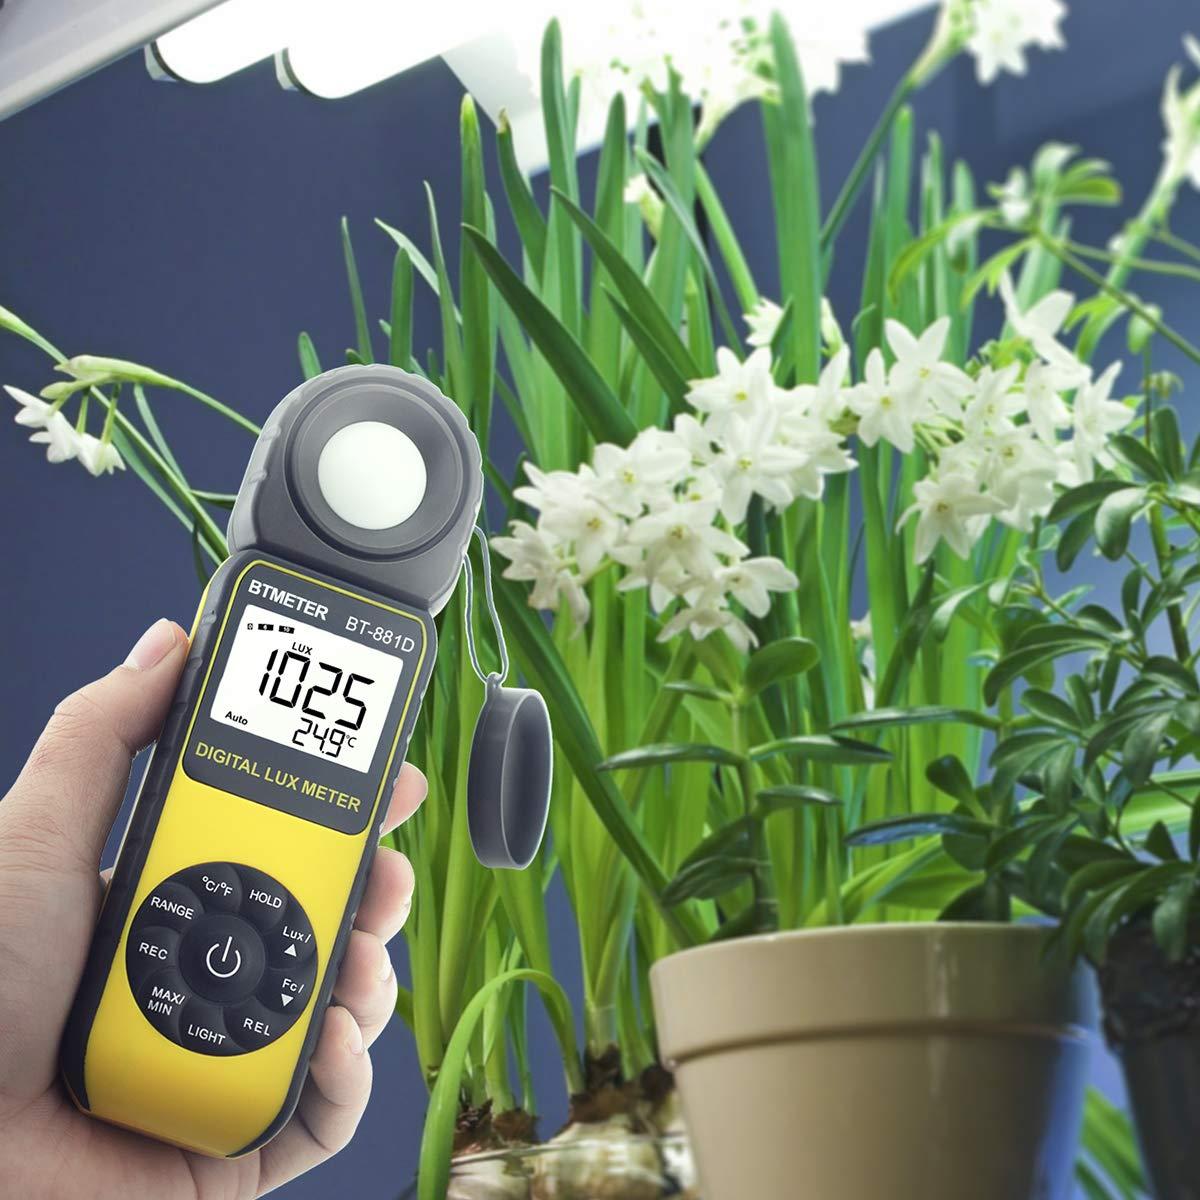 BTMETER BT-881D Digital Illuminance Light Meter, Measure Lights 0.01~400,000 Lux (0.01~40,000 FC) Foot Candles Luxmeter with 270º Rotated Sensor for Plants LED Lights Indoor Outdoor Light Tester by BTMETER (Image #6)